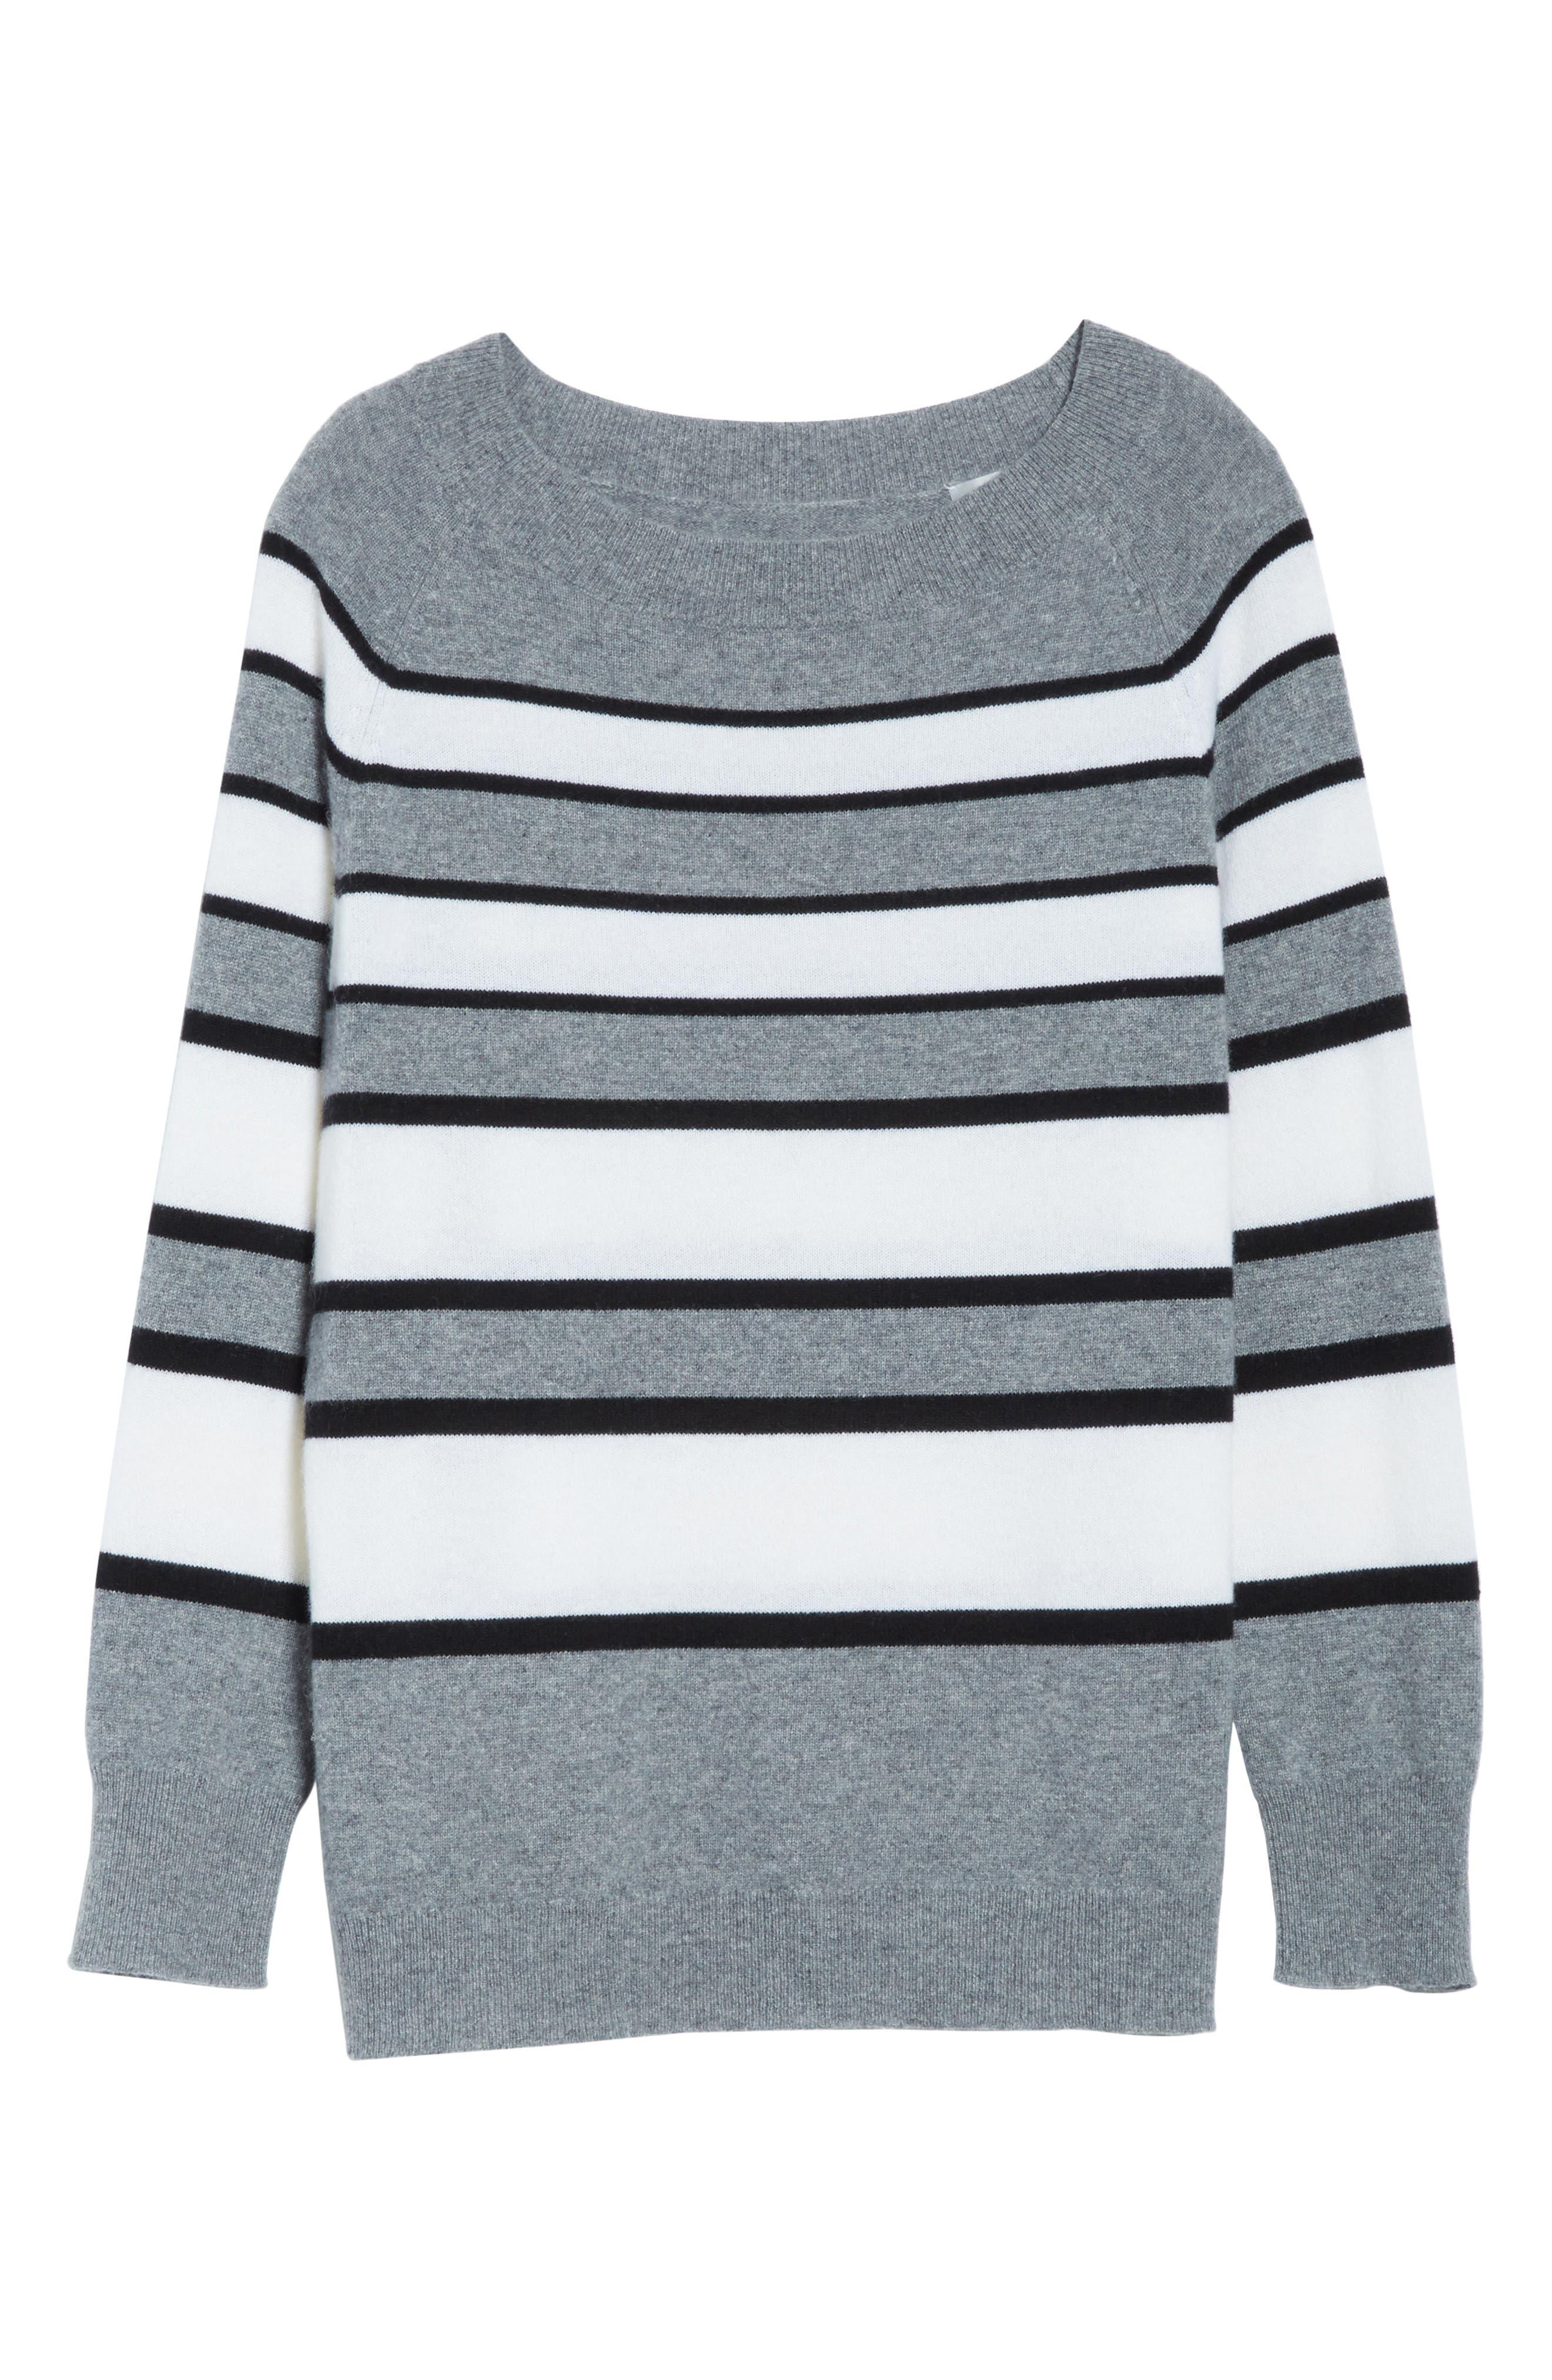 Cody Stripe Cashmere Boat Neck Sweater,                             Alternate thumbnail 6, color,                             Heather Grey Multi